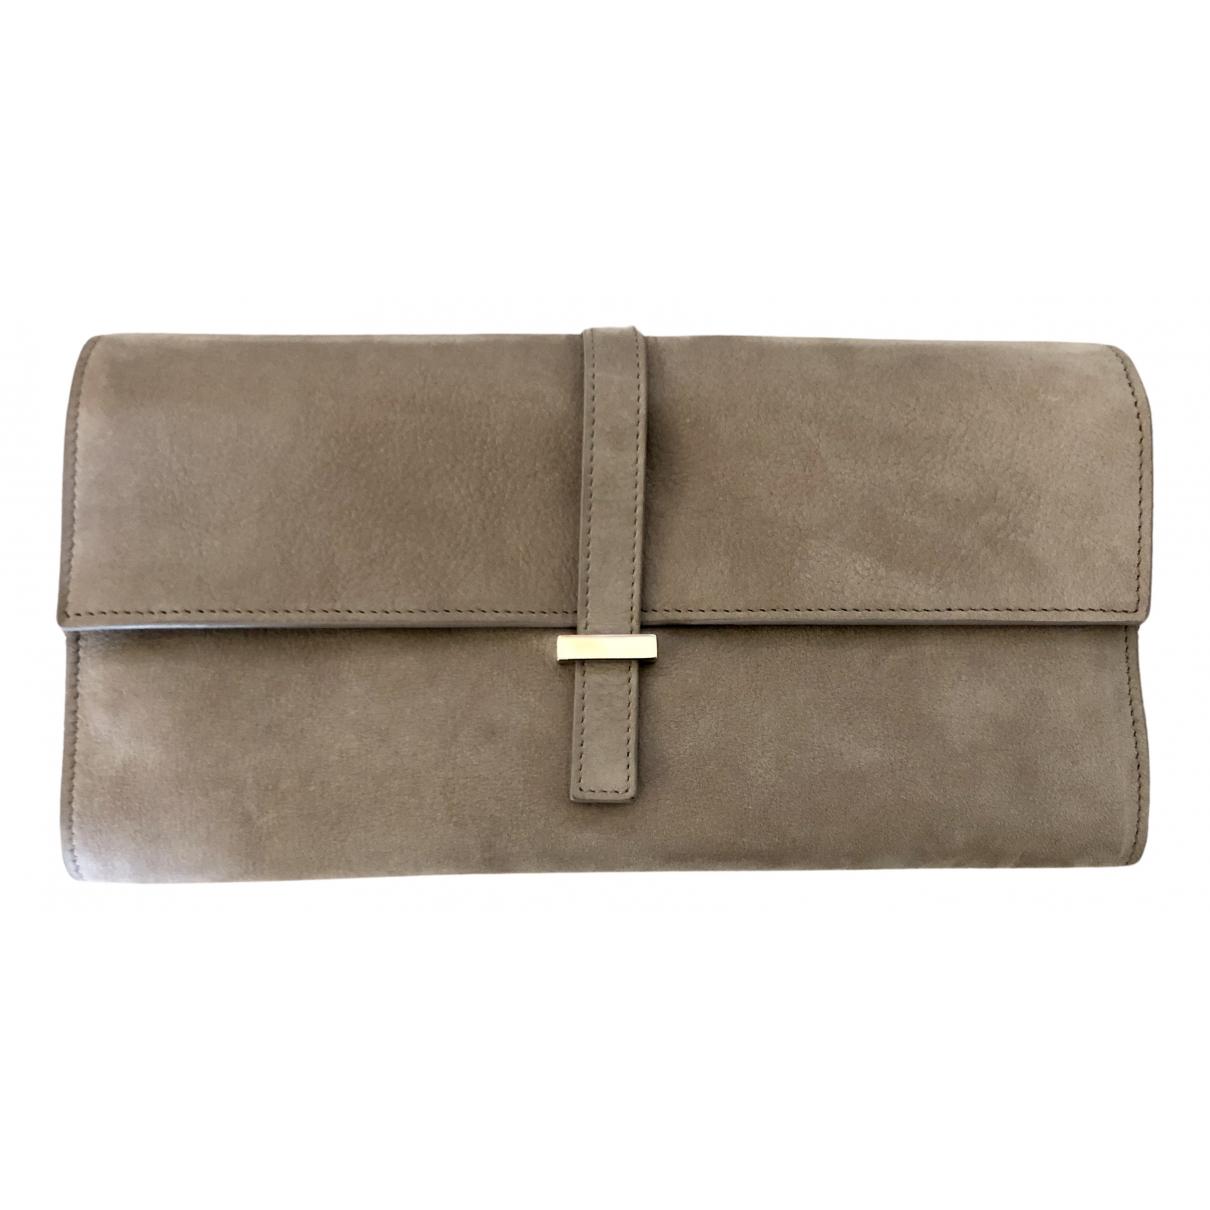 Asprey Of London N Grey Leather Purses, wallet & cases for Women N